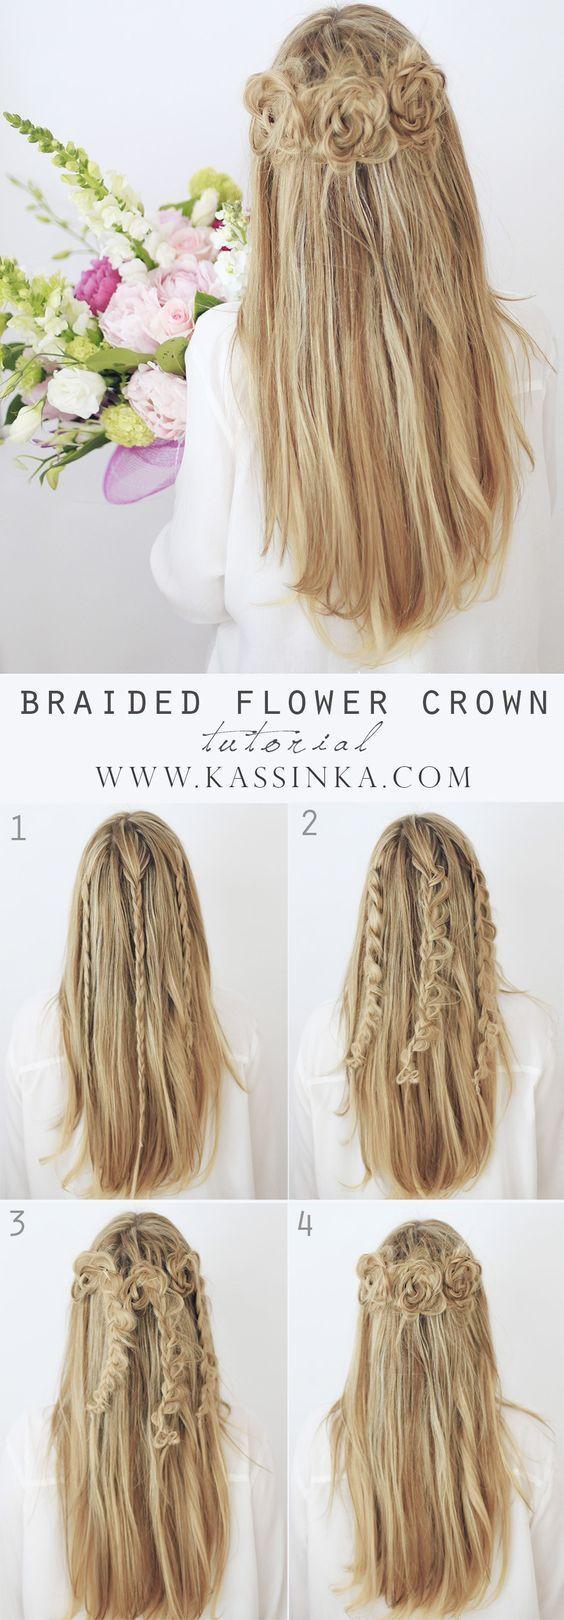 190 best ◘Hair Tutorials◘ images on Pinterest | Hair ideas ...